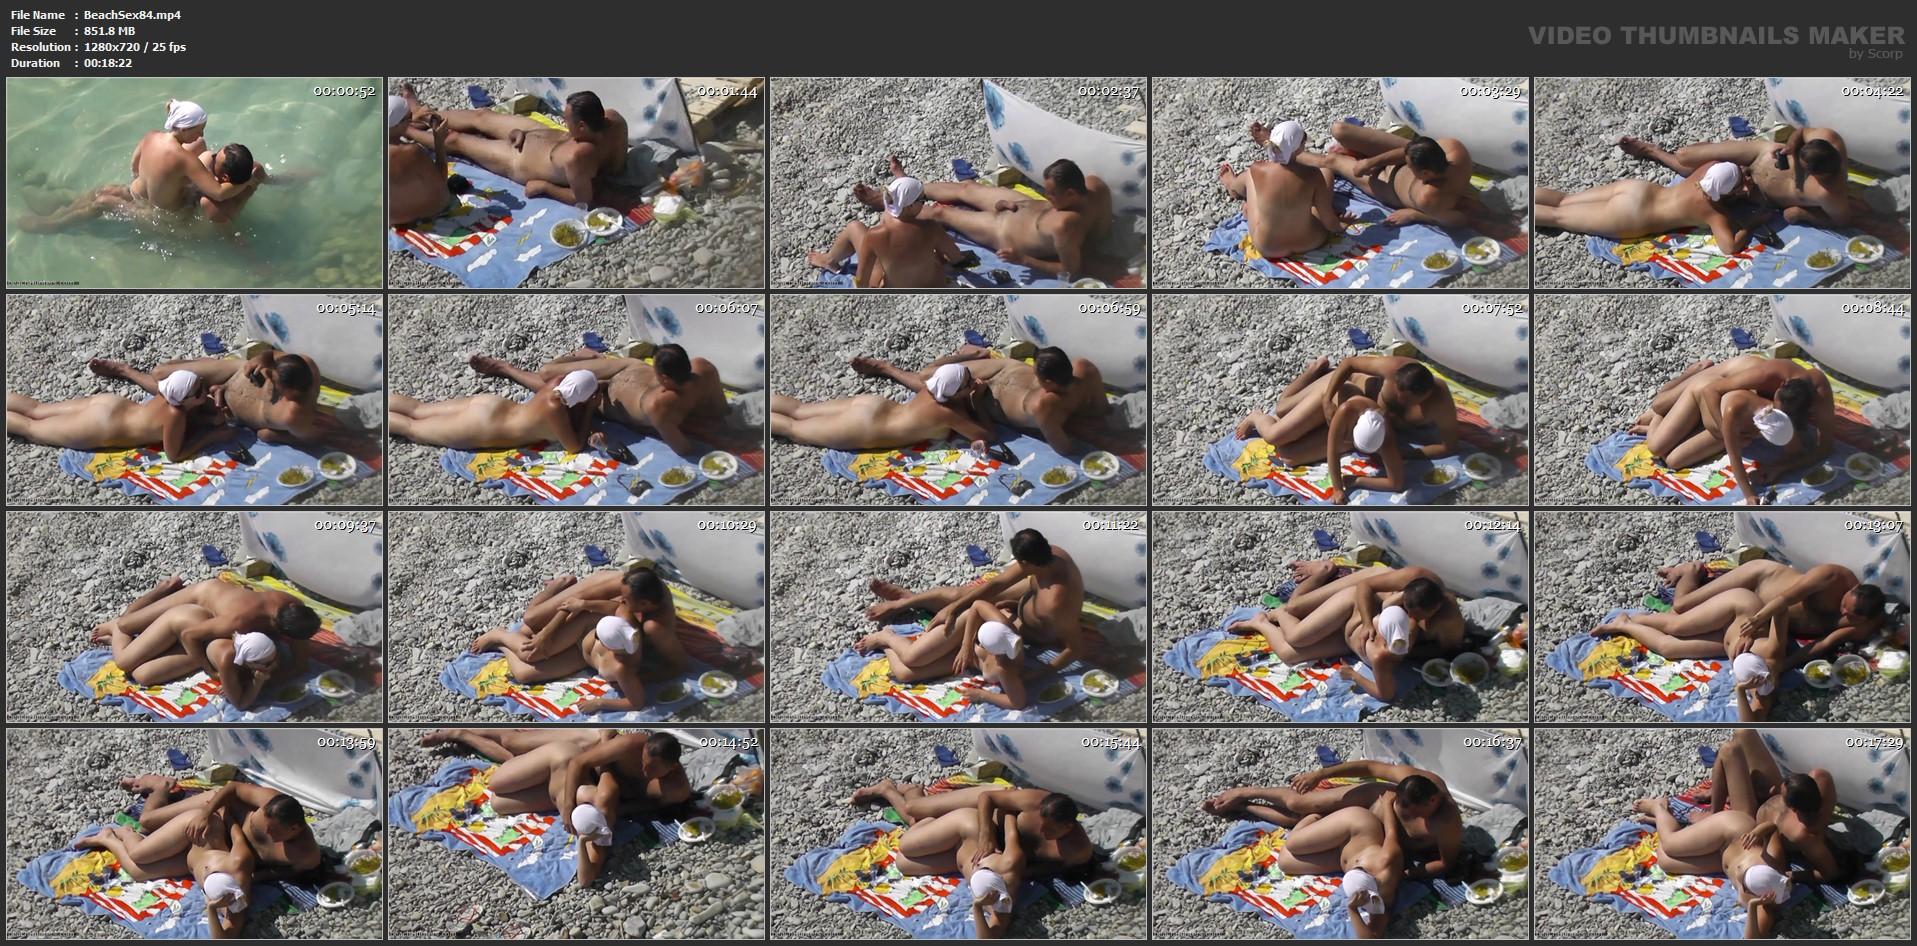 beachsex84-mp4